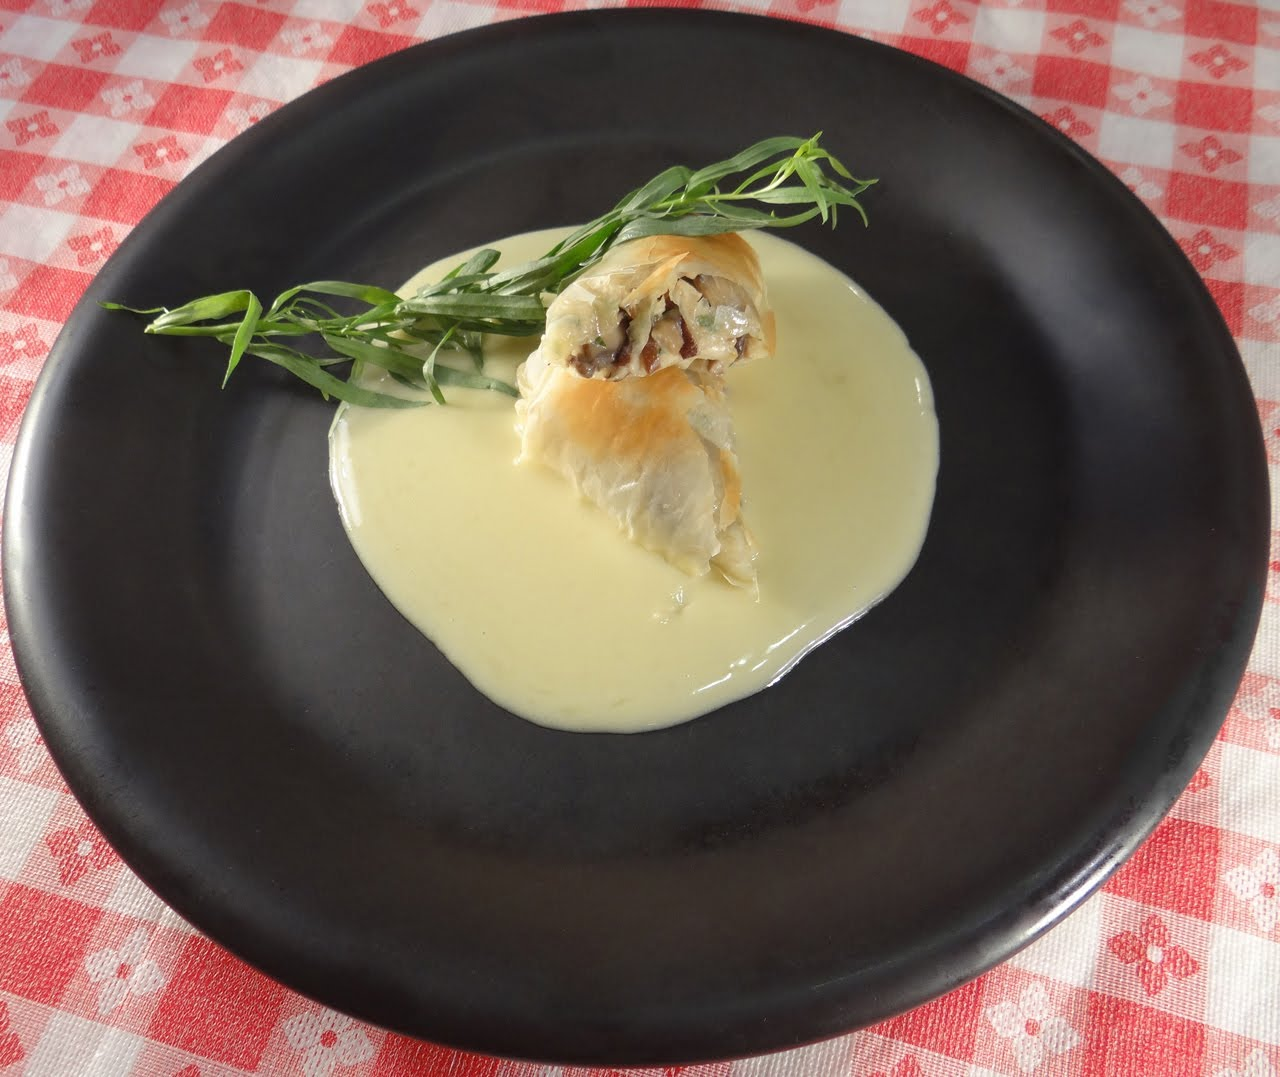 Classic Beurre Blanc Recipe: Wild Mushroom Strudel With Beurre Blanc Butter Sauce DIY